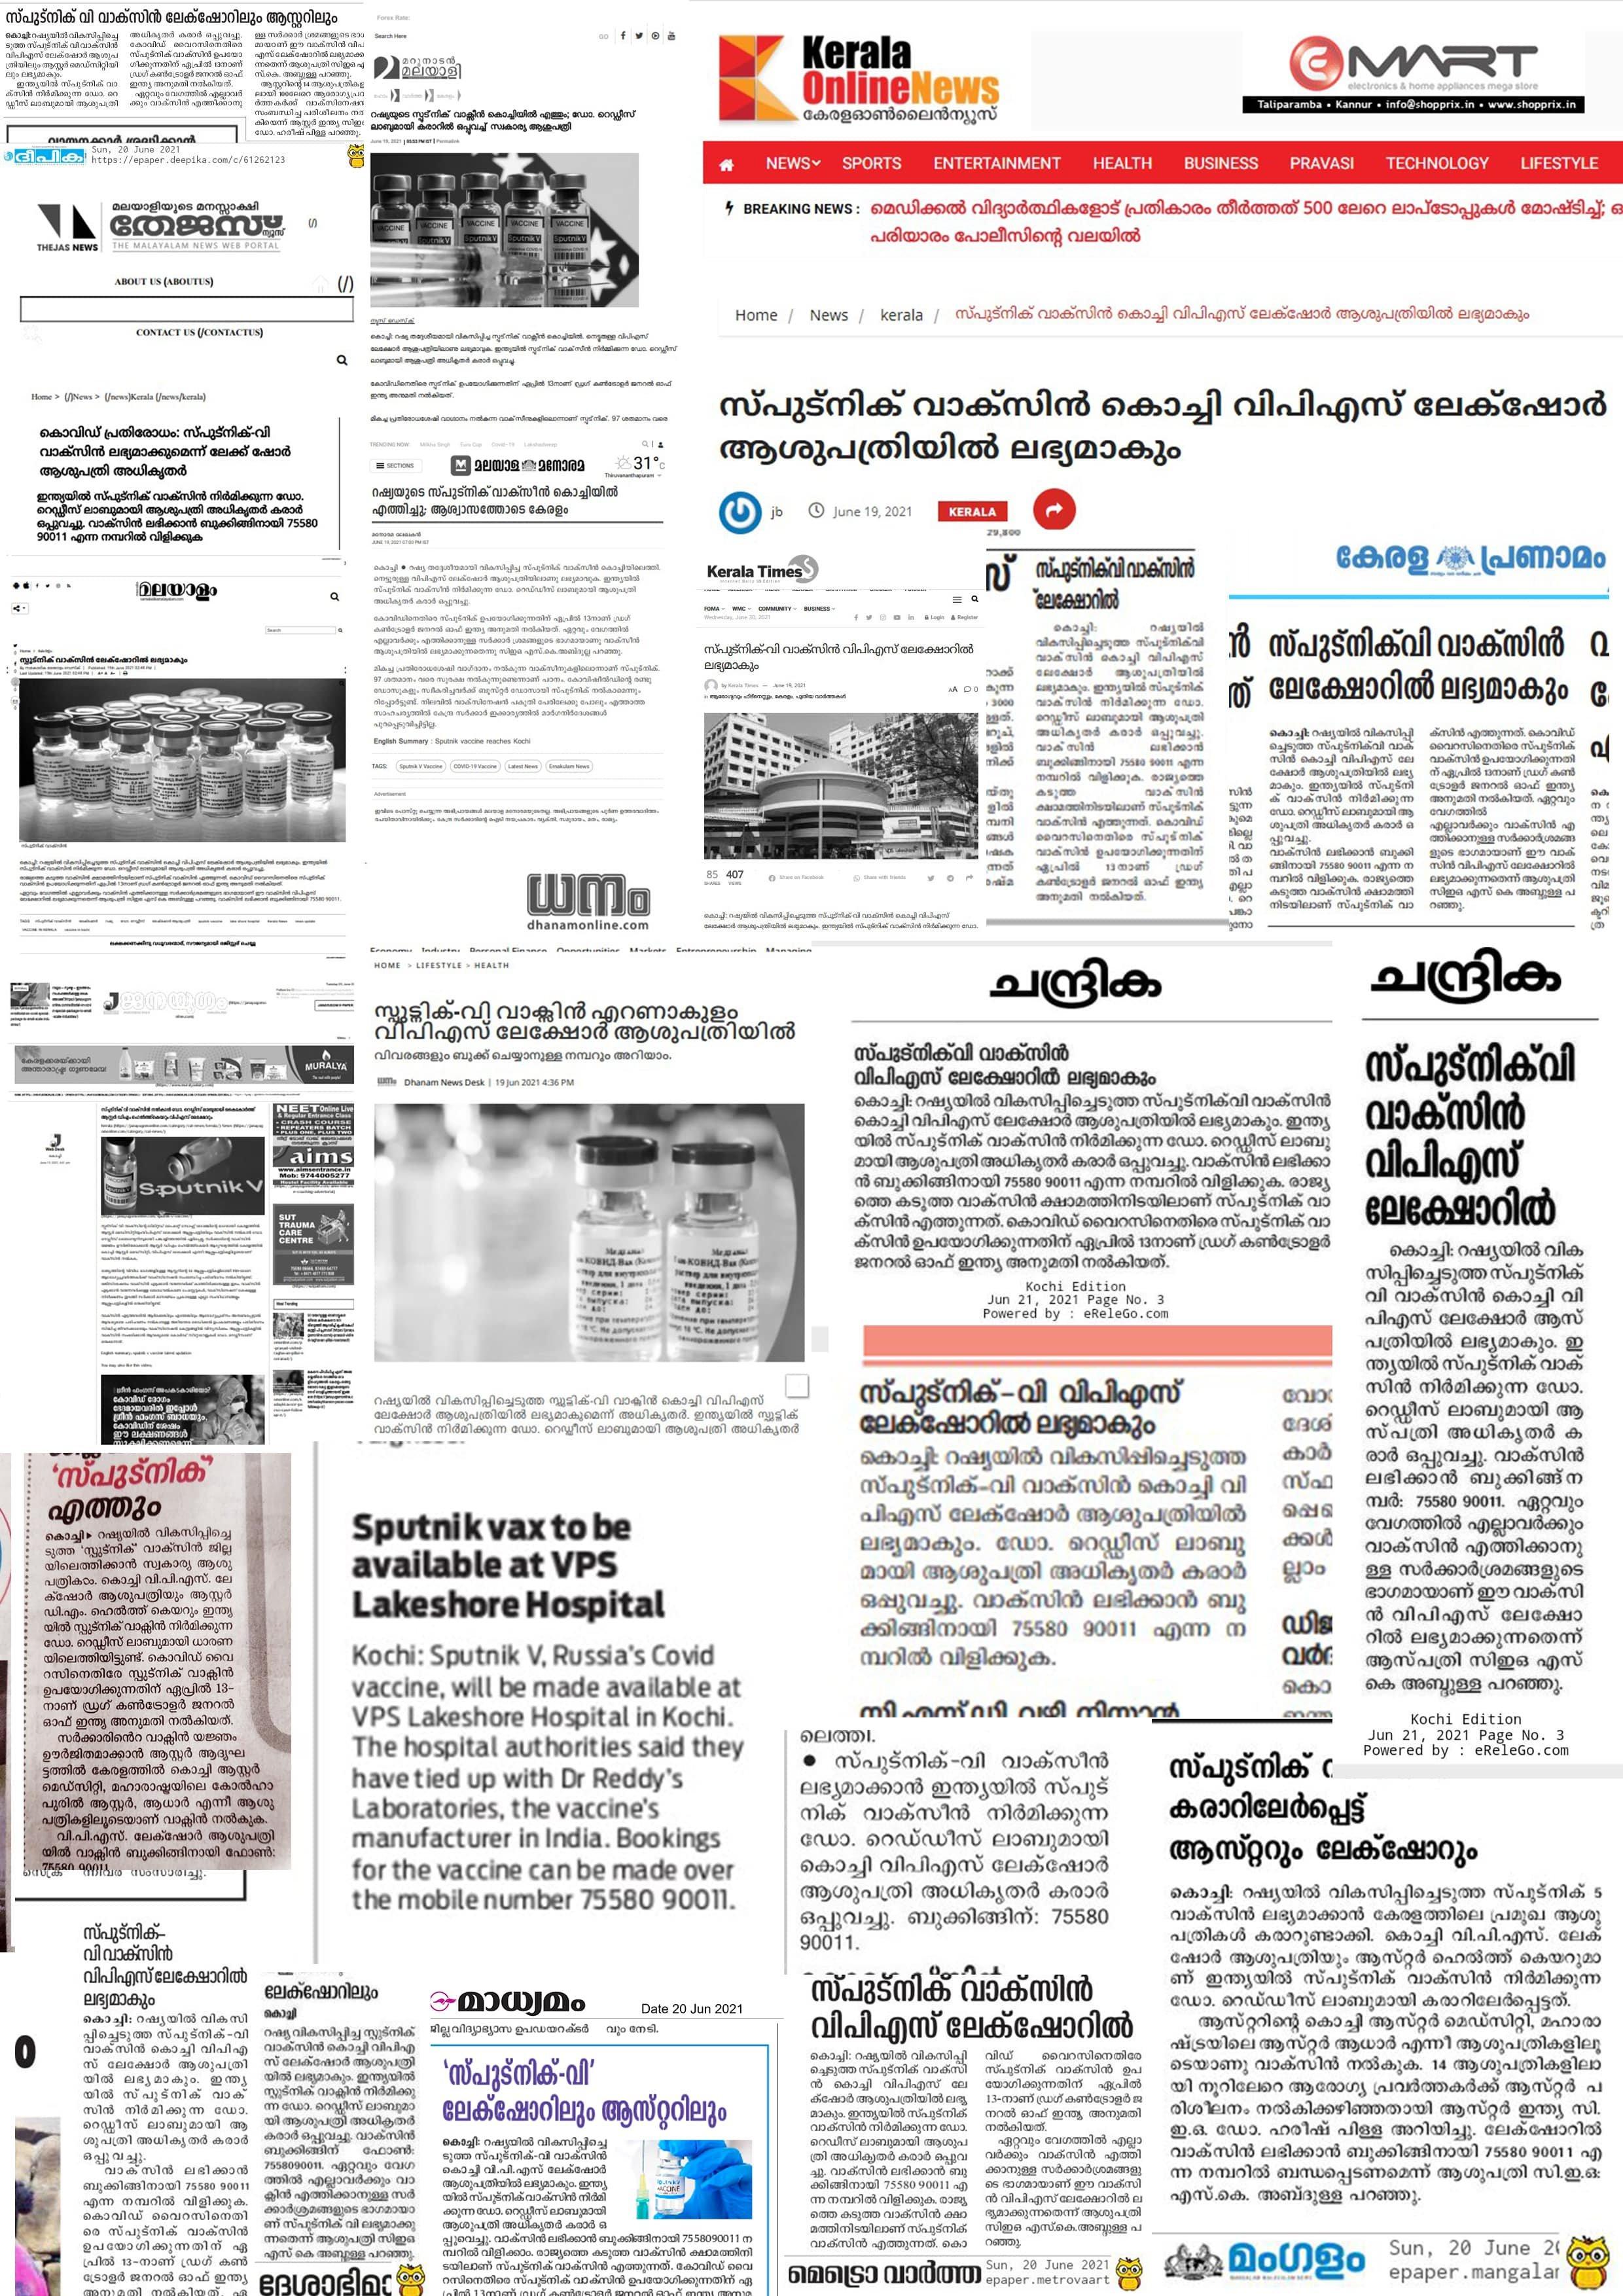 uploads/news/vpslakeshoreincorporatessputnikvvaccine-kochikerala-min-iqc4IPClkfBOmvt.jpg